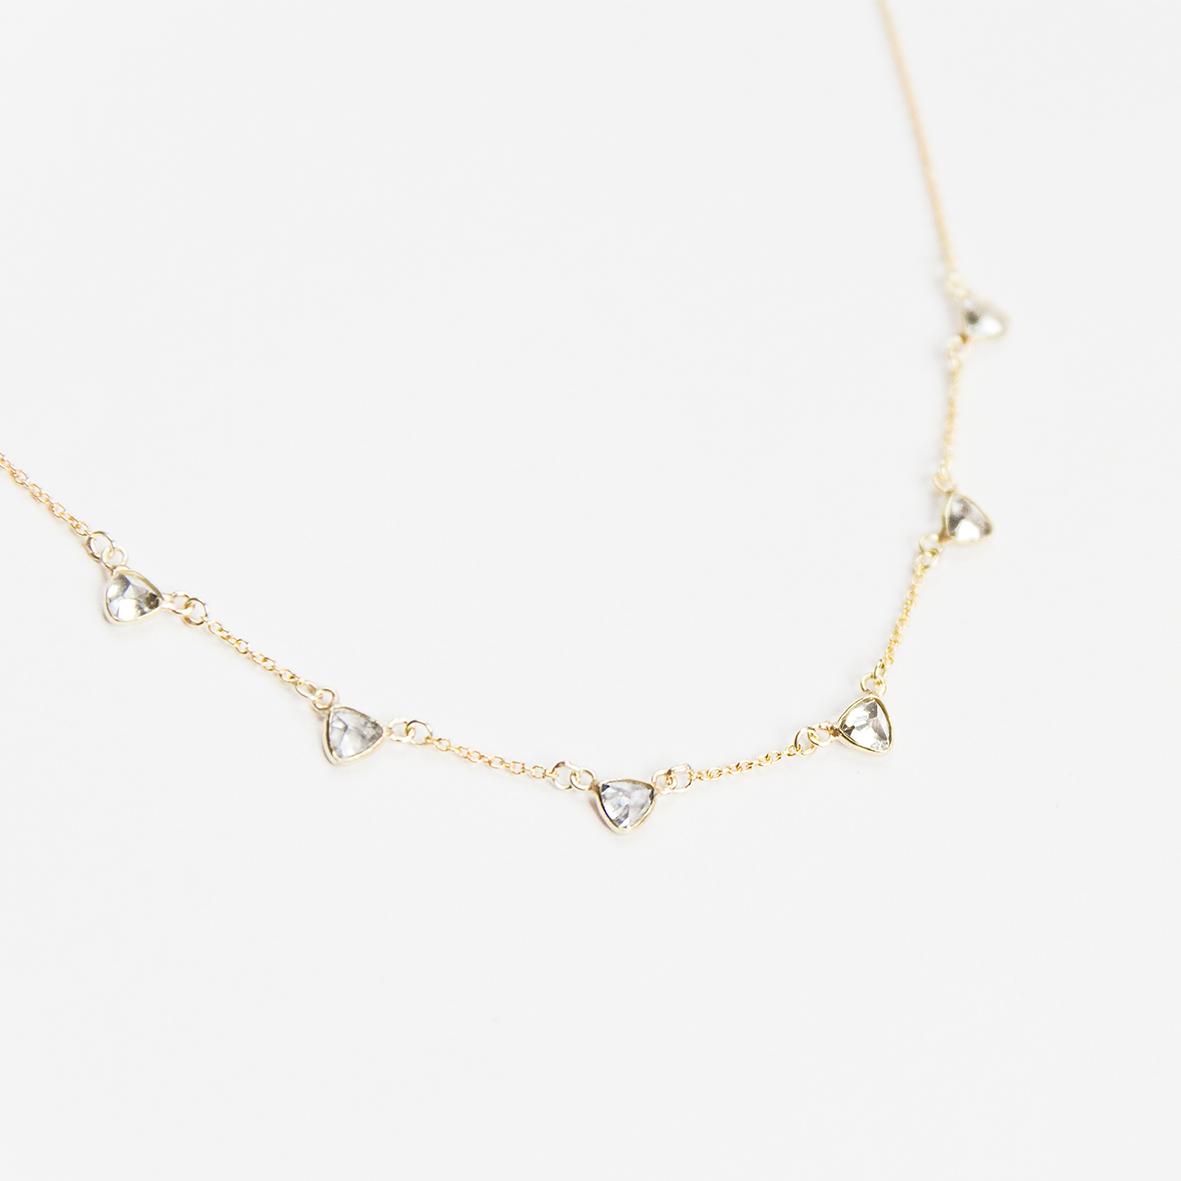 8. OONA_philo_principal_sapphire triangles necklace